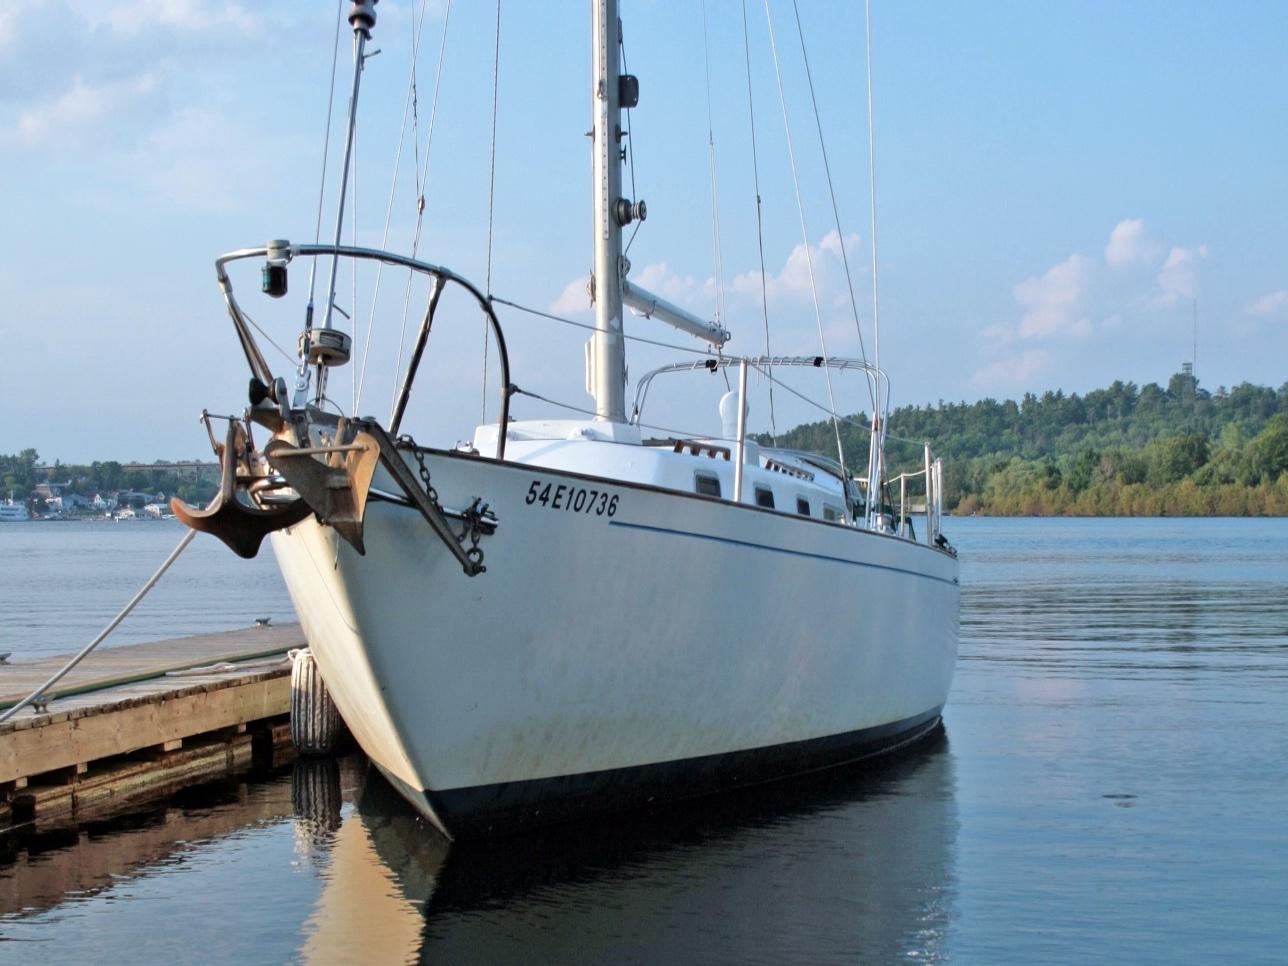 Sailboat+Lily+Pads.jpg